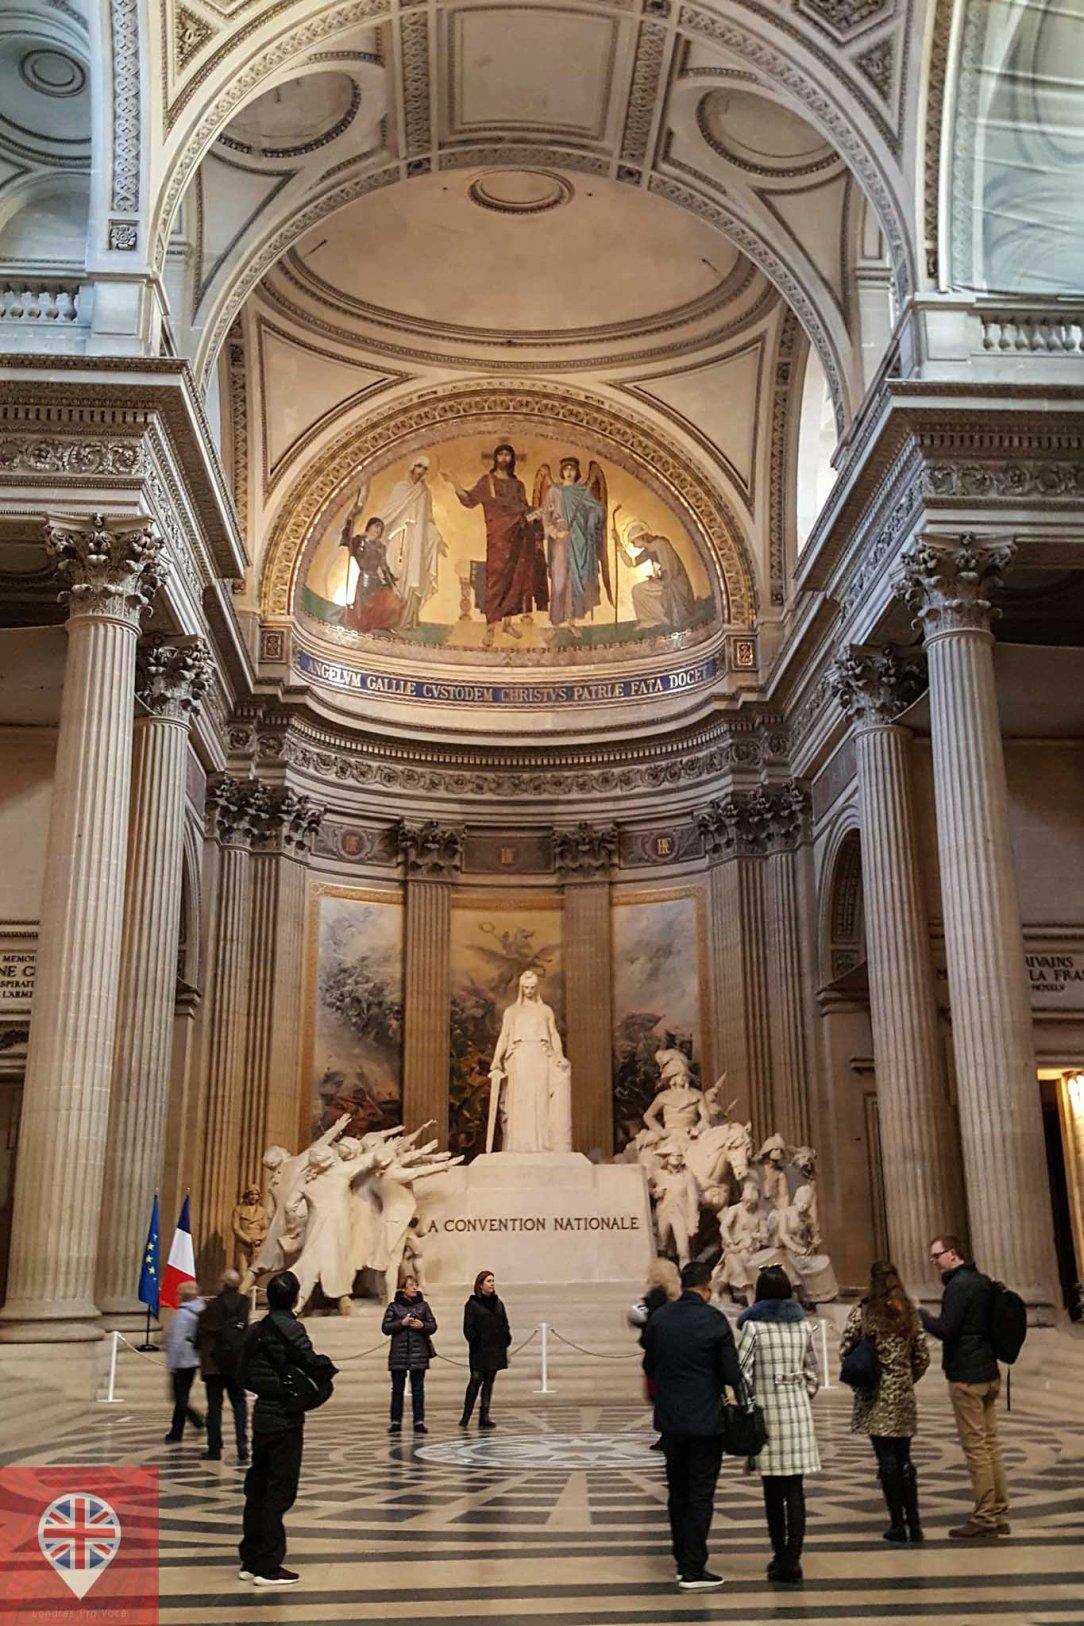 paris pantheon interior